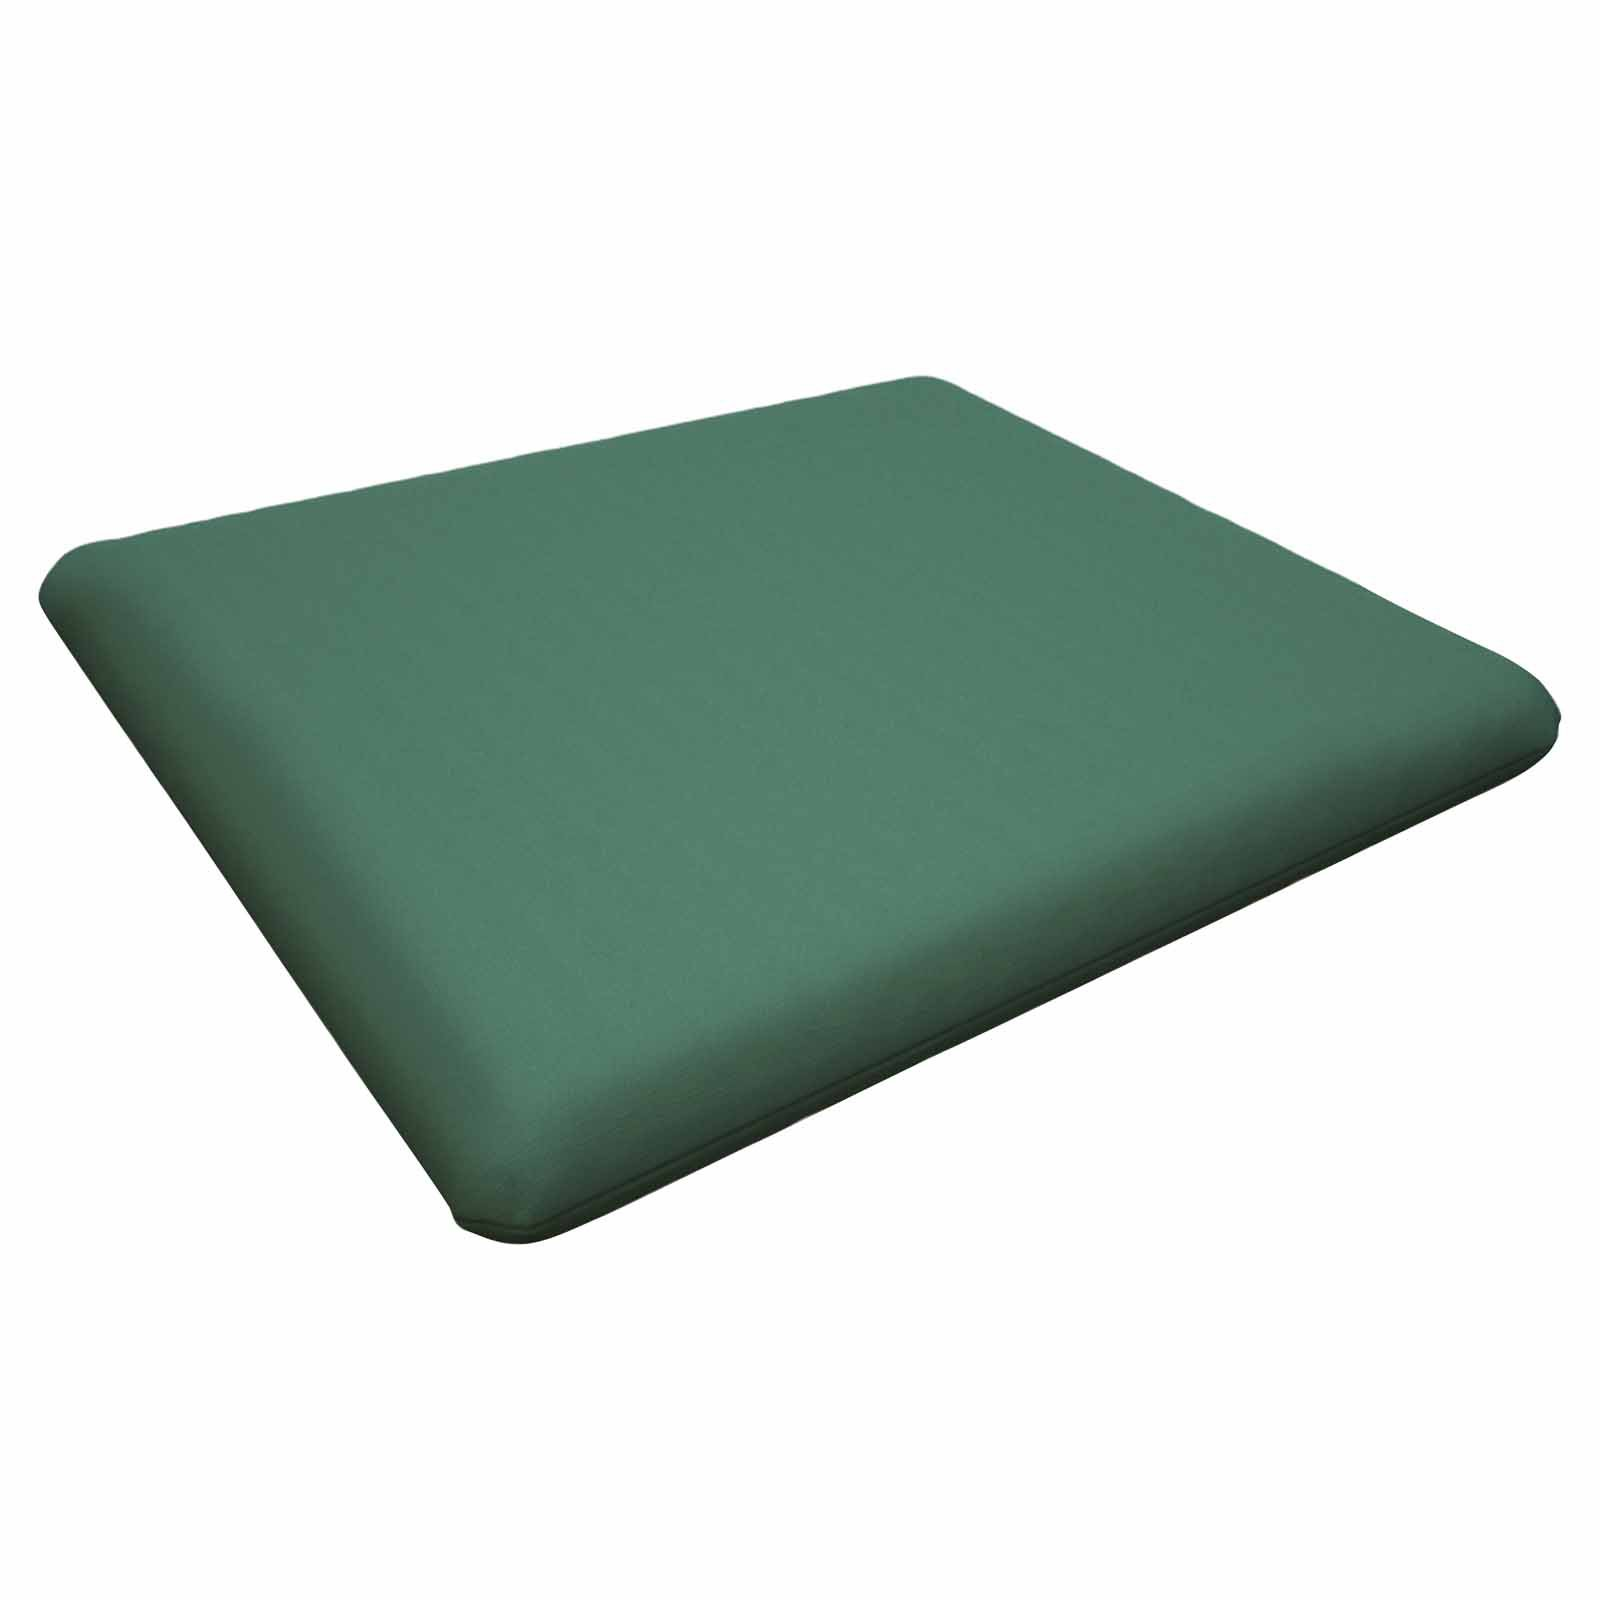 POLYWOOD® Sunbrella 20 x 20 in. Rocking Chair Seat Cushion